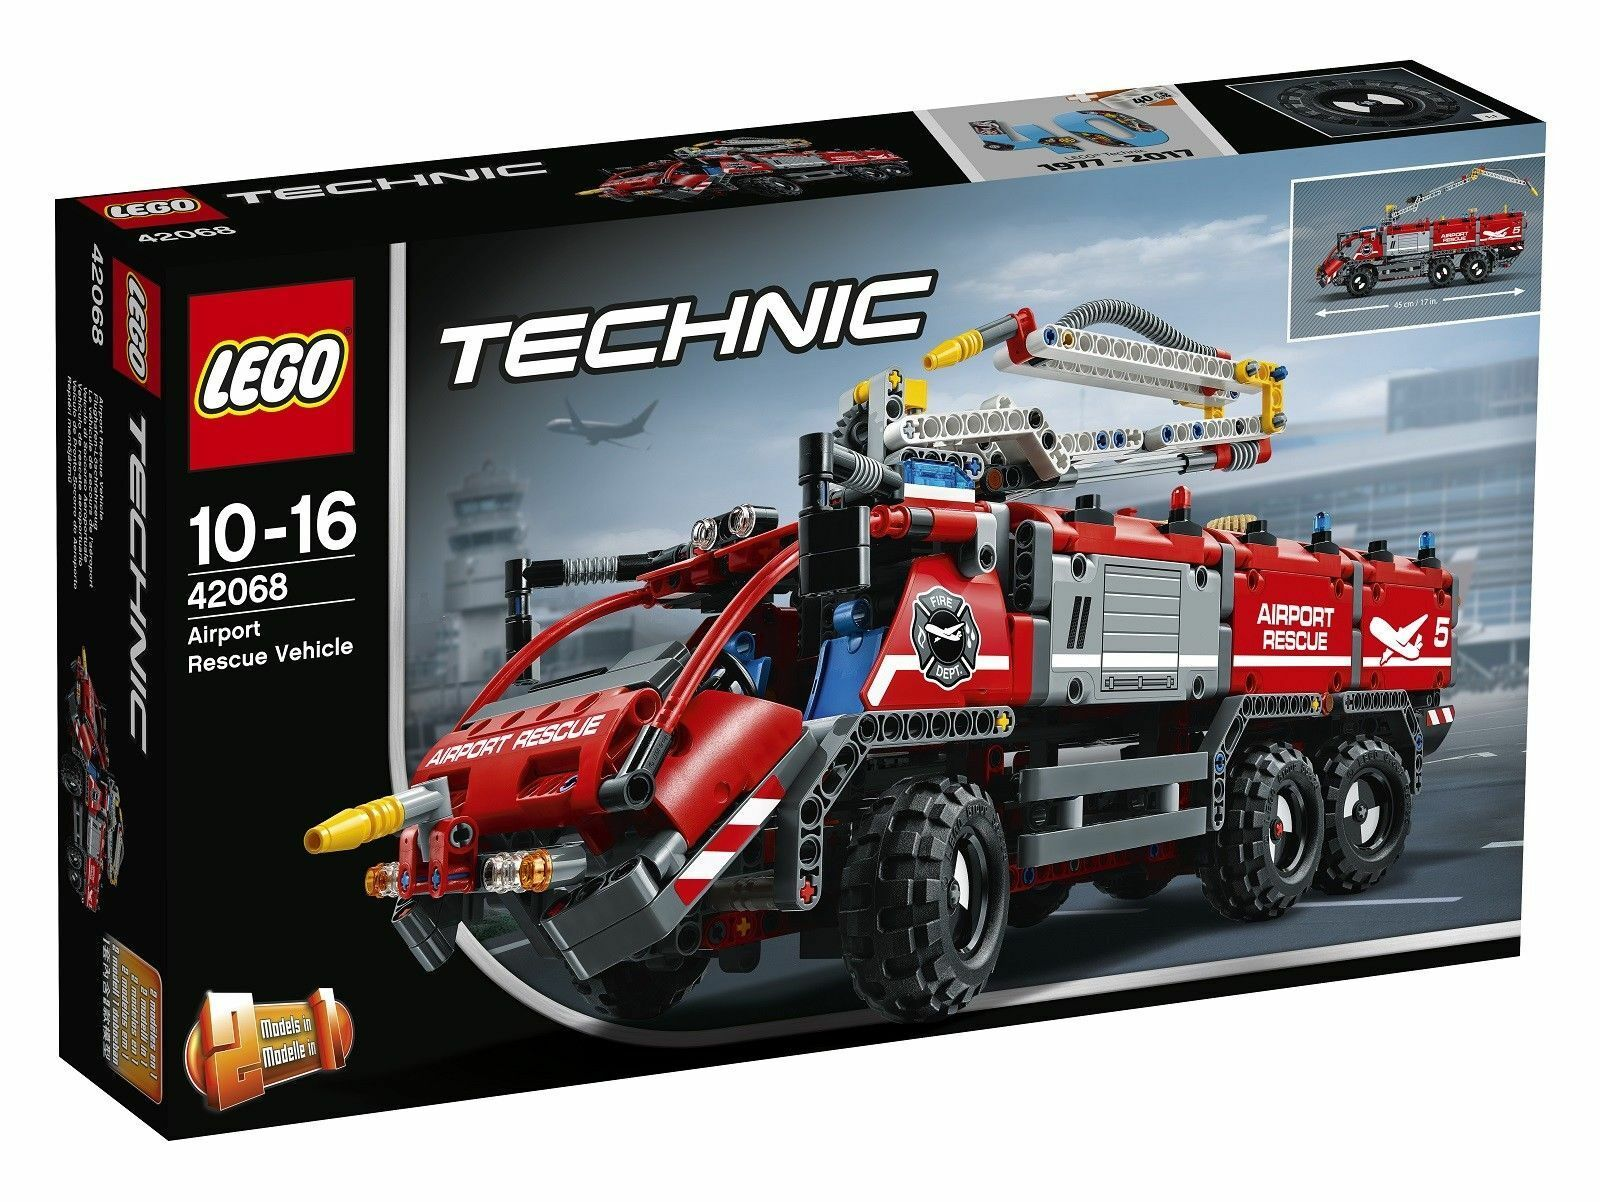 LEGO Technic Airport Rescue Vehicle 2017 (42068) - BRAND NEW RETIROT